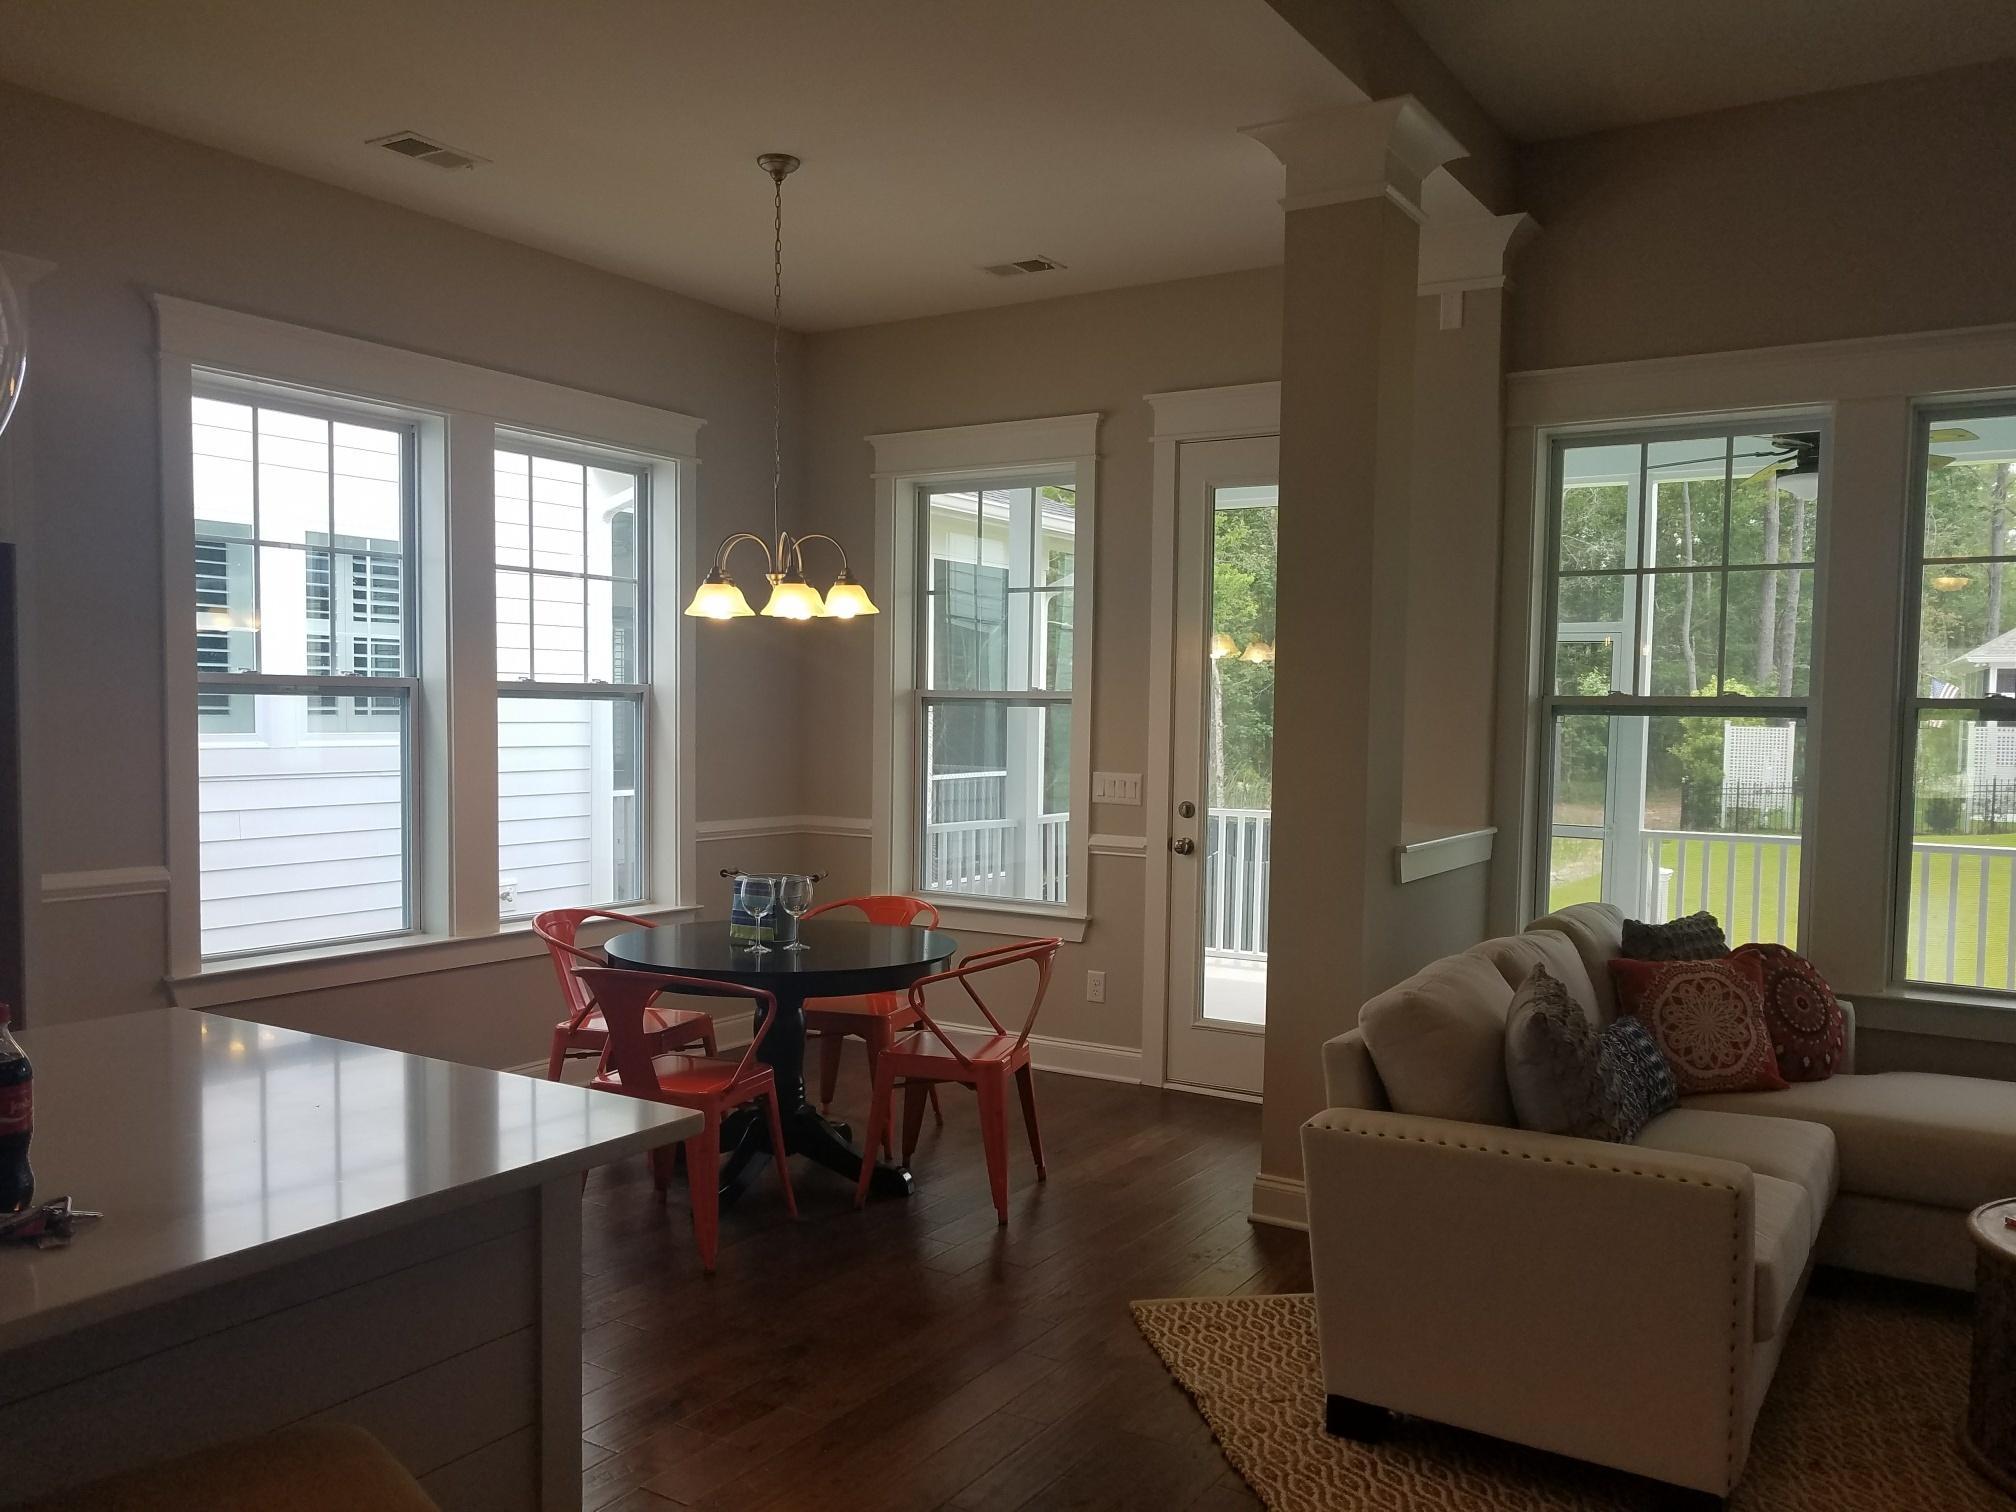 Carolina Park Homes For Sale - 1583 Old Rivers Gate, Mount Pleasant, SC - 26